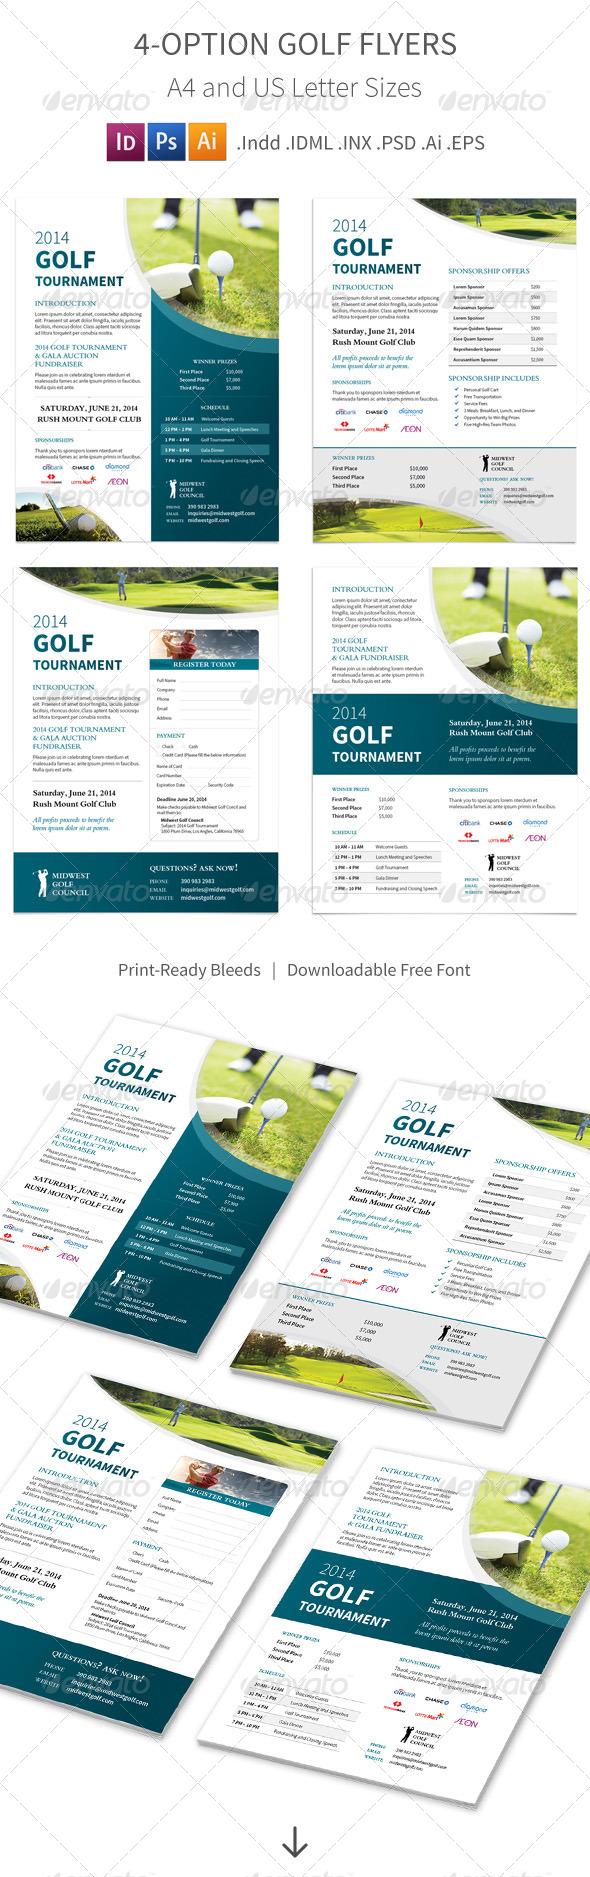 GraphicRiver Golf Tournament Flyers 4 Options 8503591